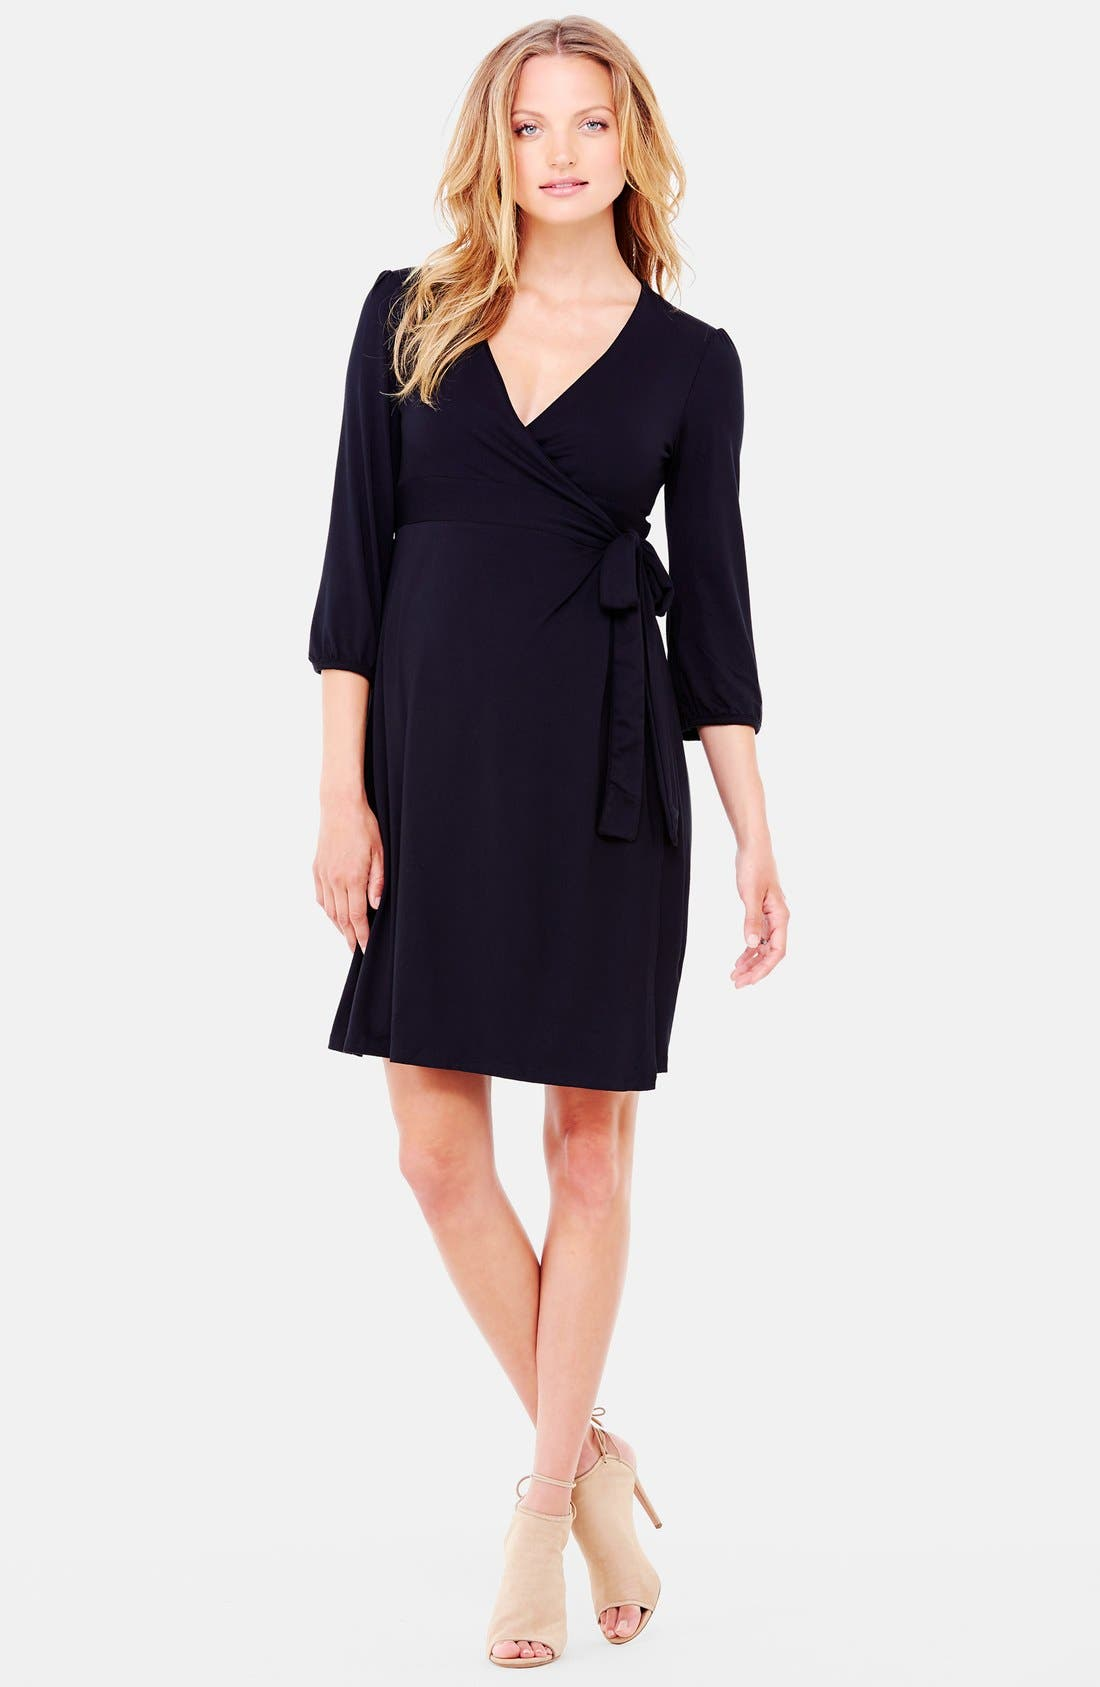 Nursing Friendly Maternity Wrap Dress,                         Main,                         color, Jet Black